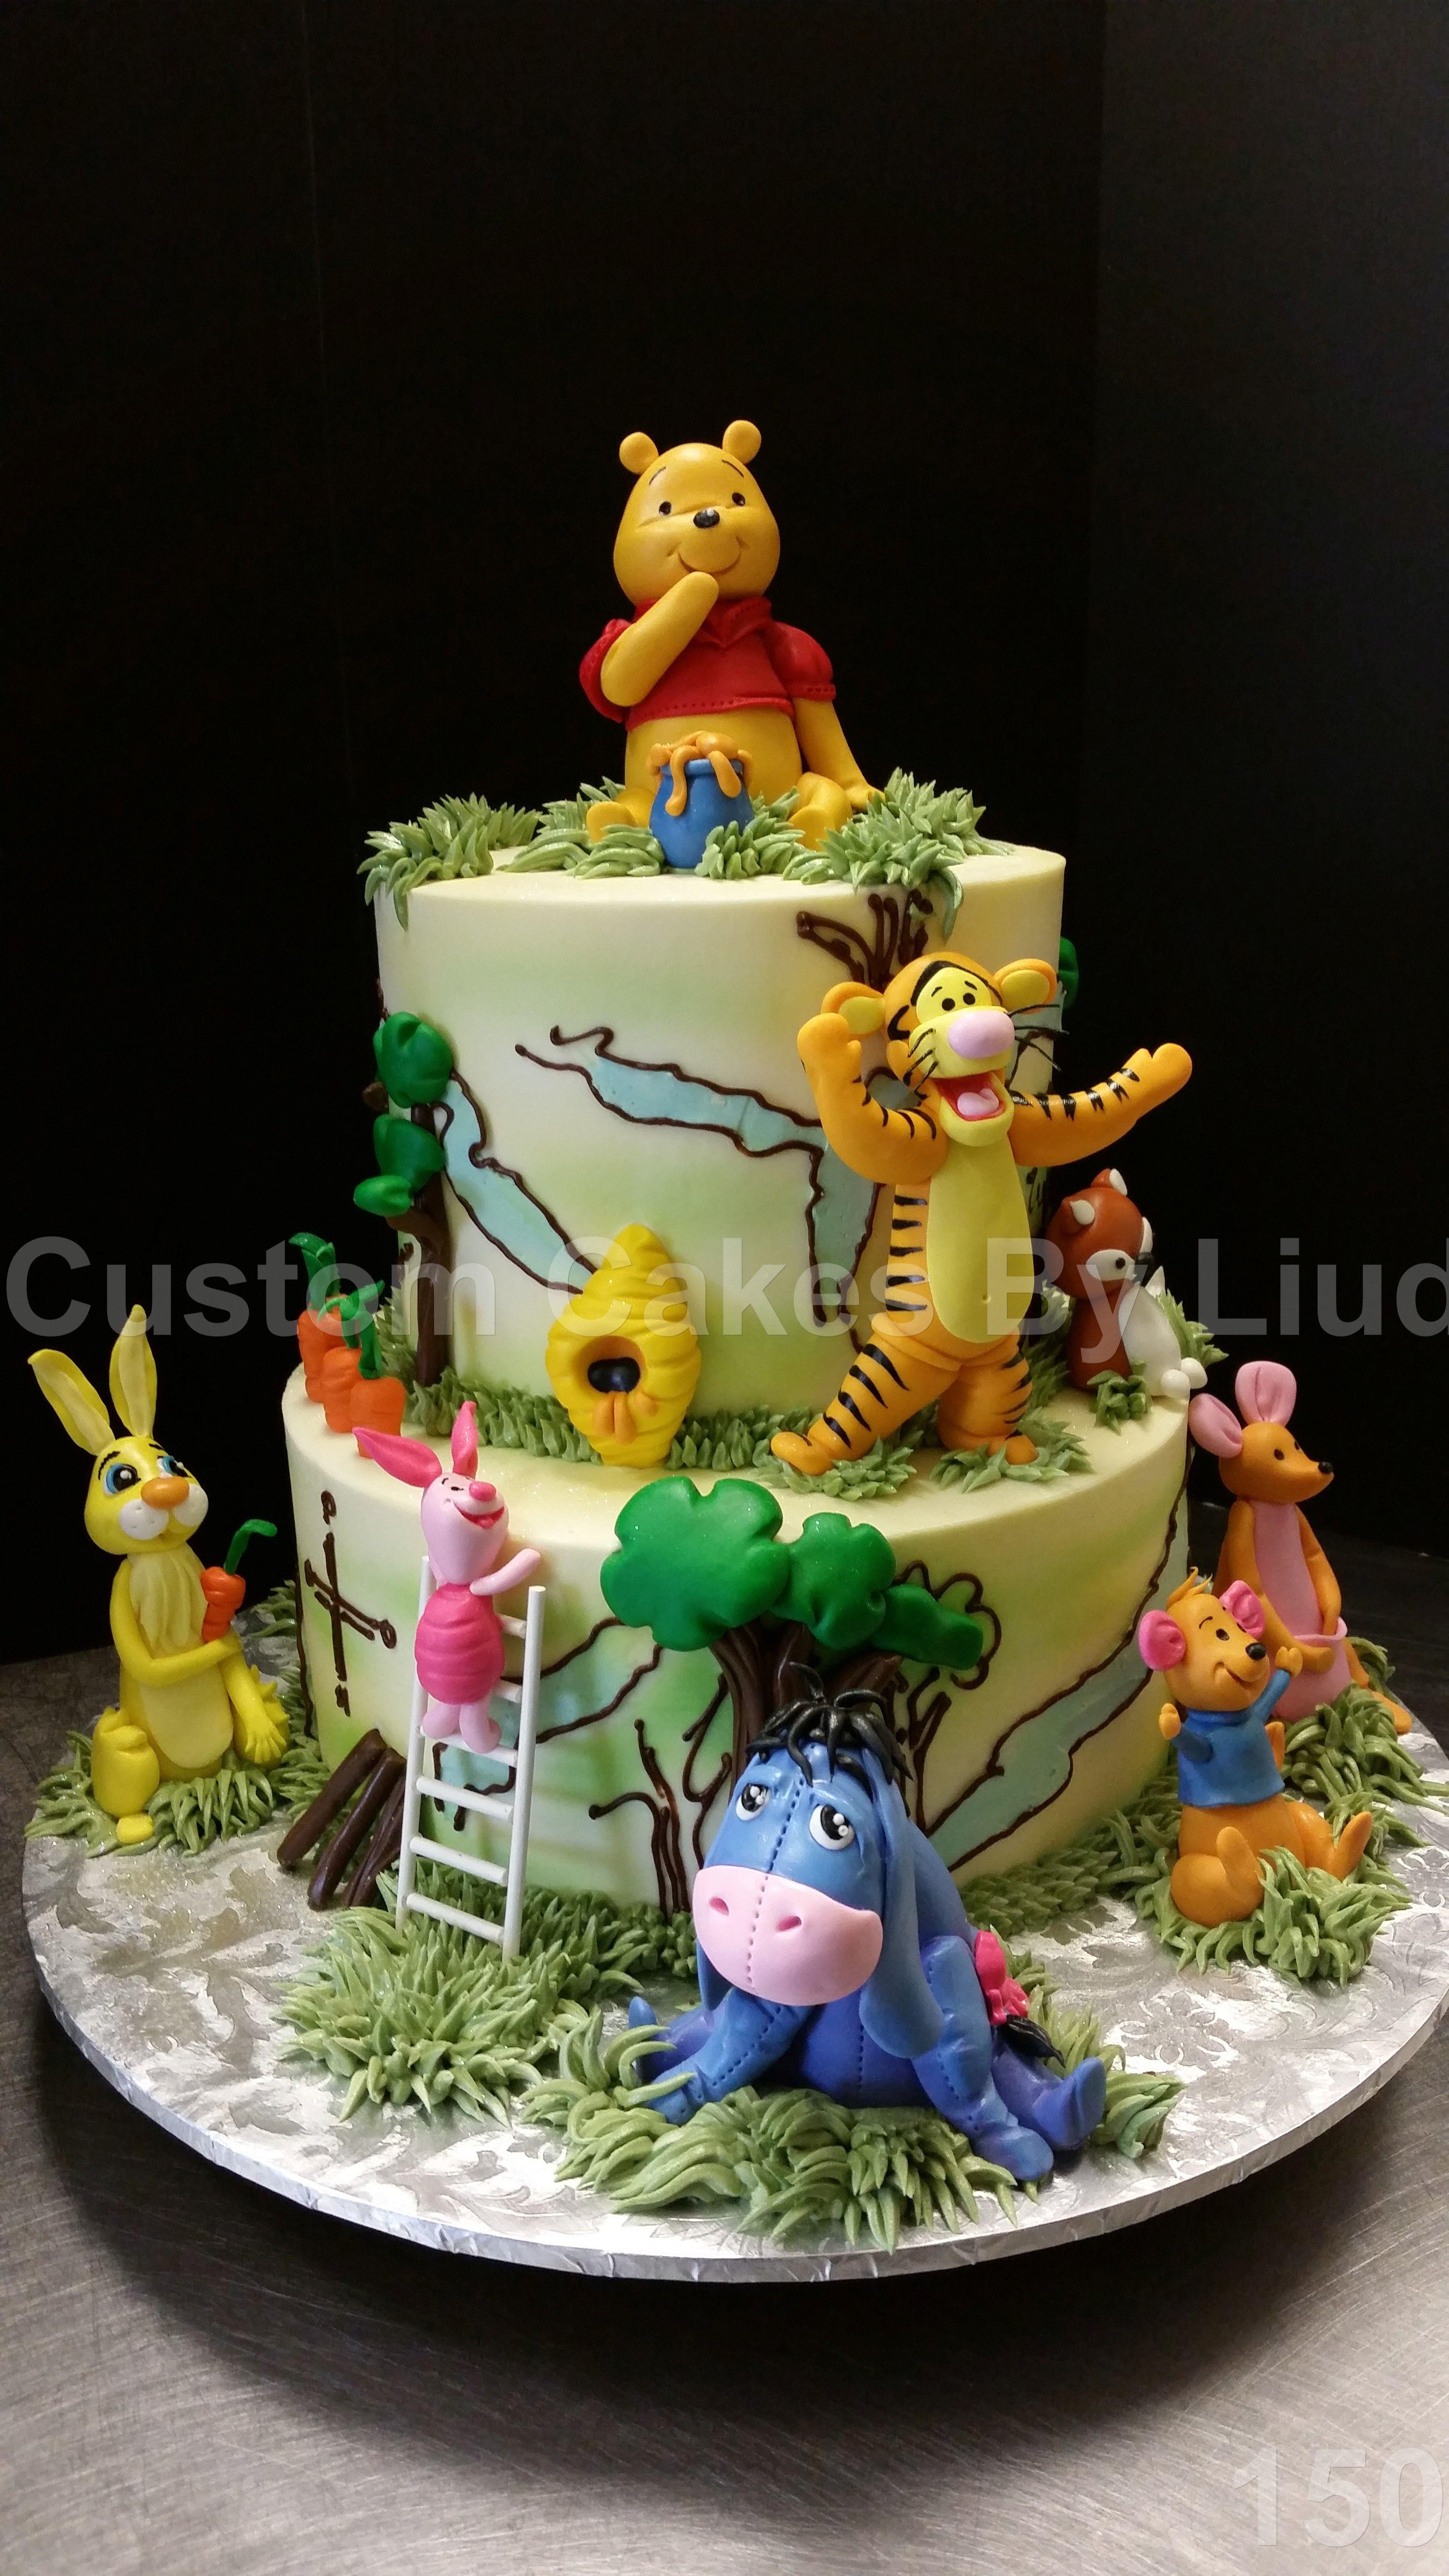 25+ Beautiful Picture of Birthday Cakes Atlanta | birthday cake kids ...